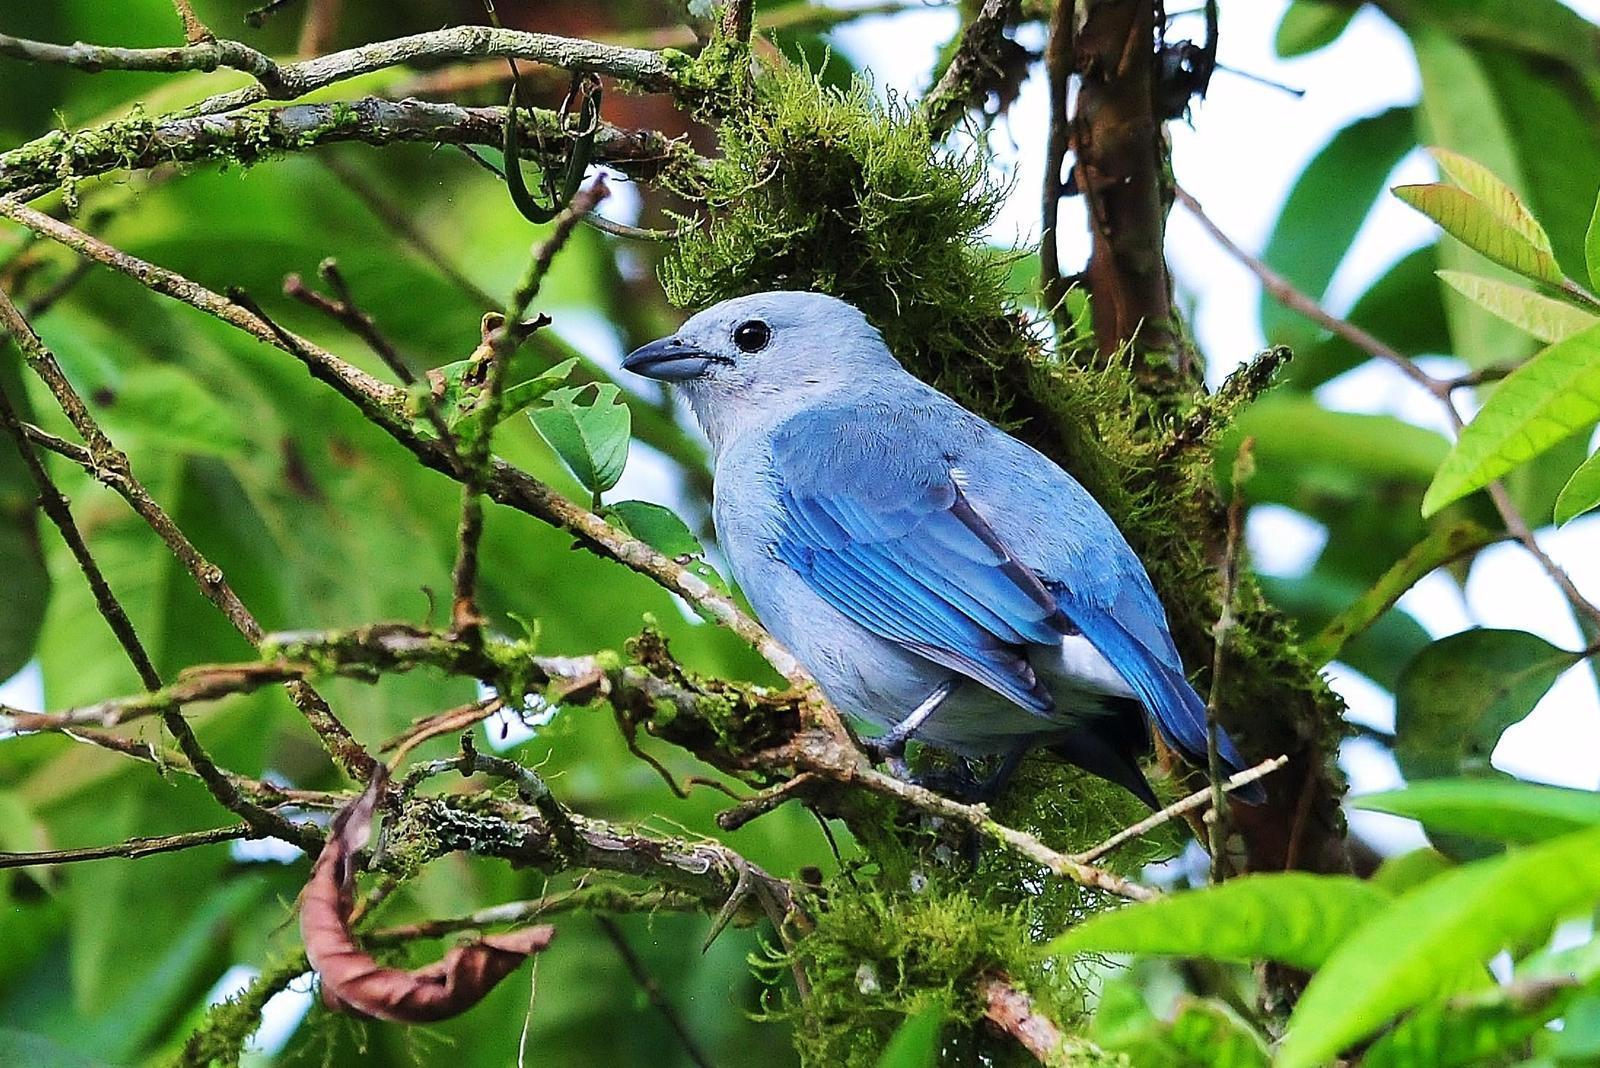 Blue-gray Tanager (Blue-gray) Photo by Matthew McCluskey